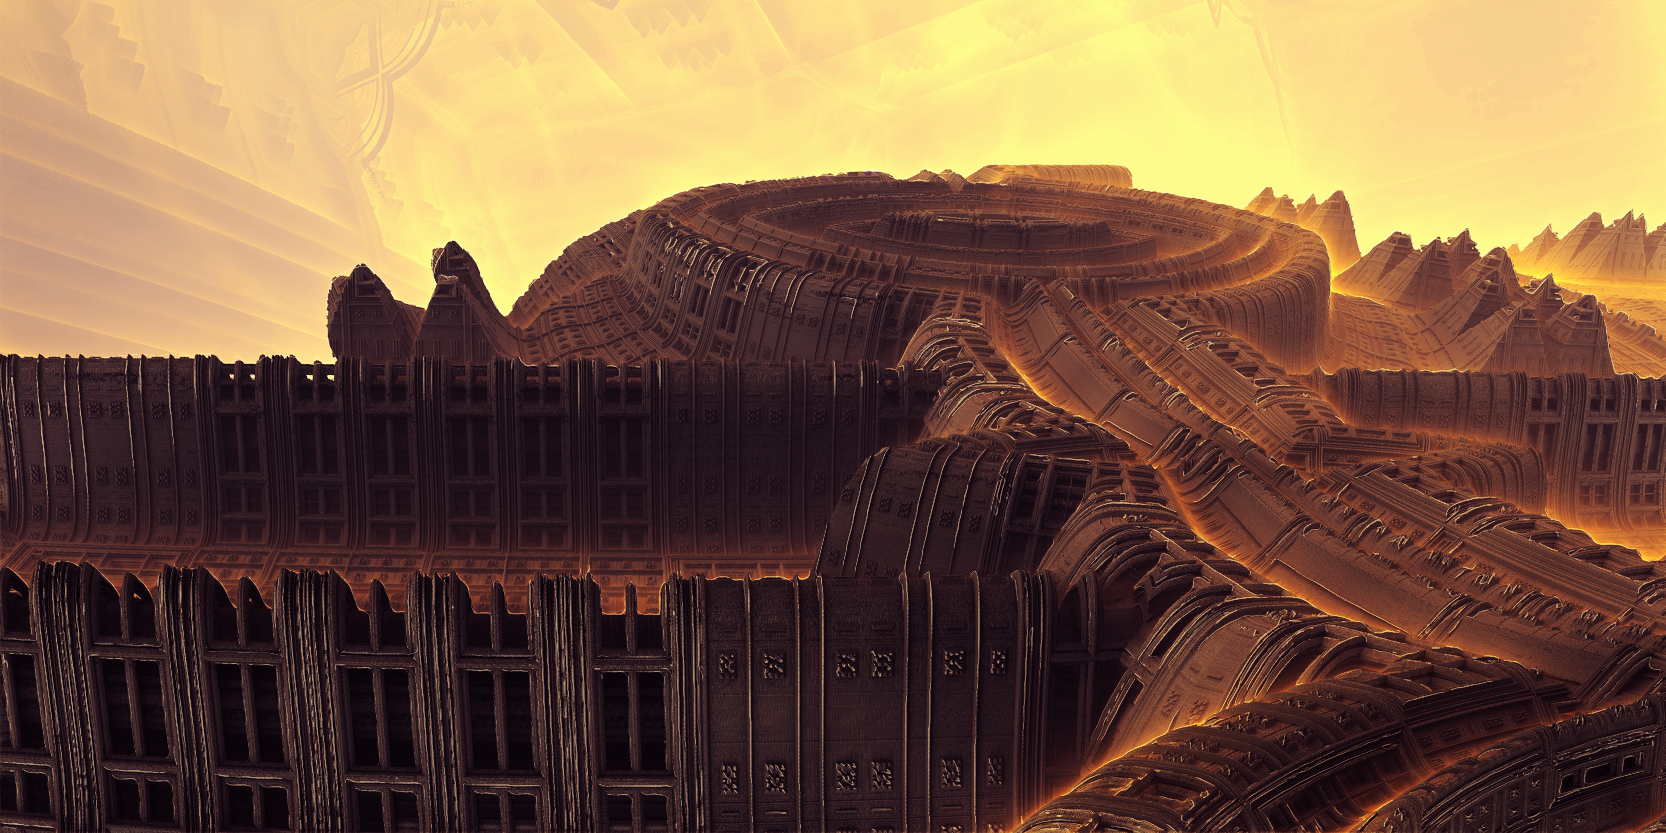 Mobius - Solar stadium by KPEKEP